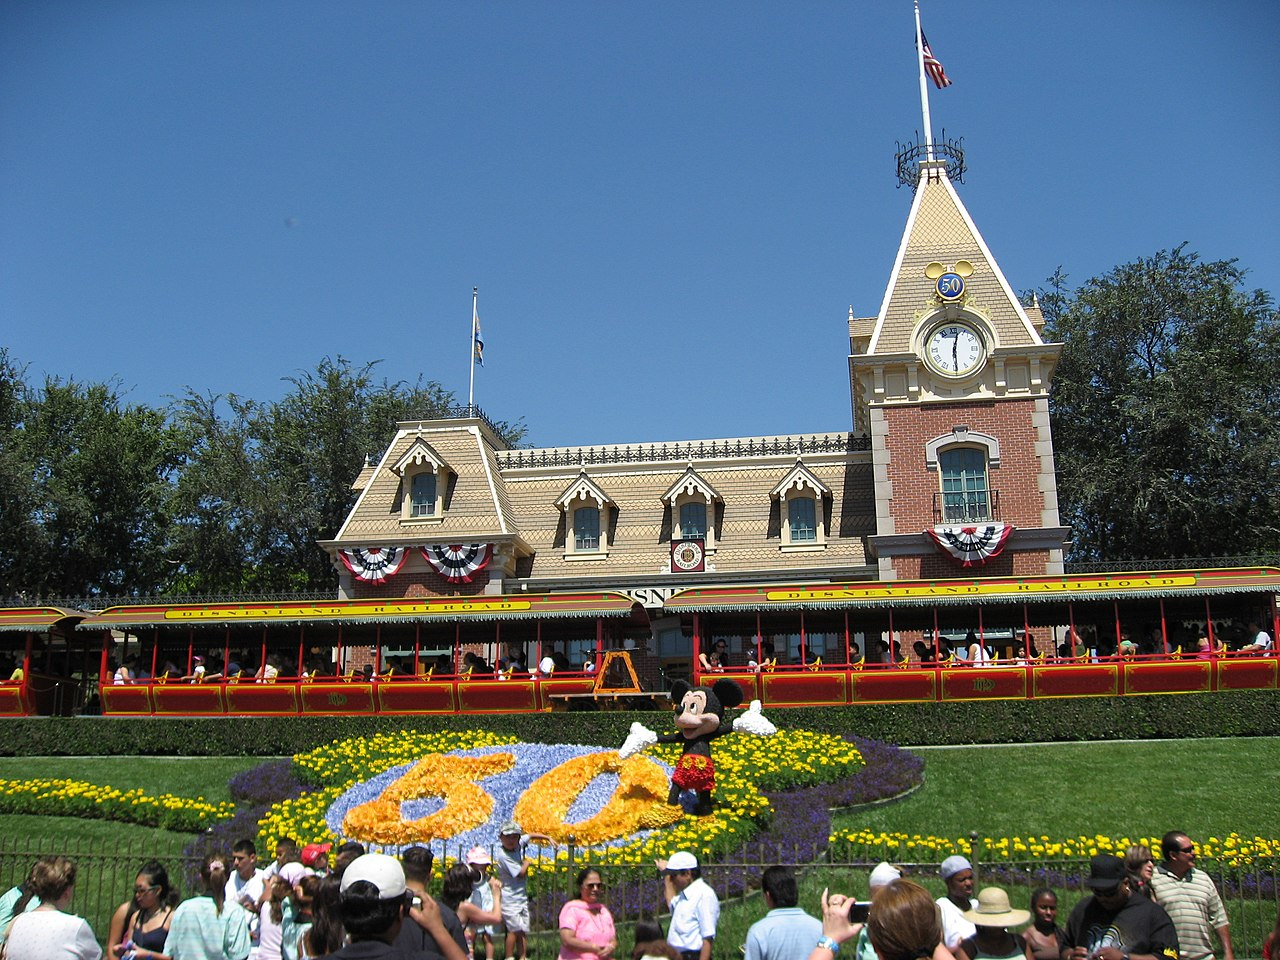 Dreamland Hotel Disneyland Paris